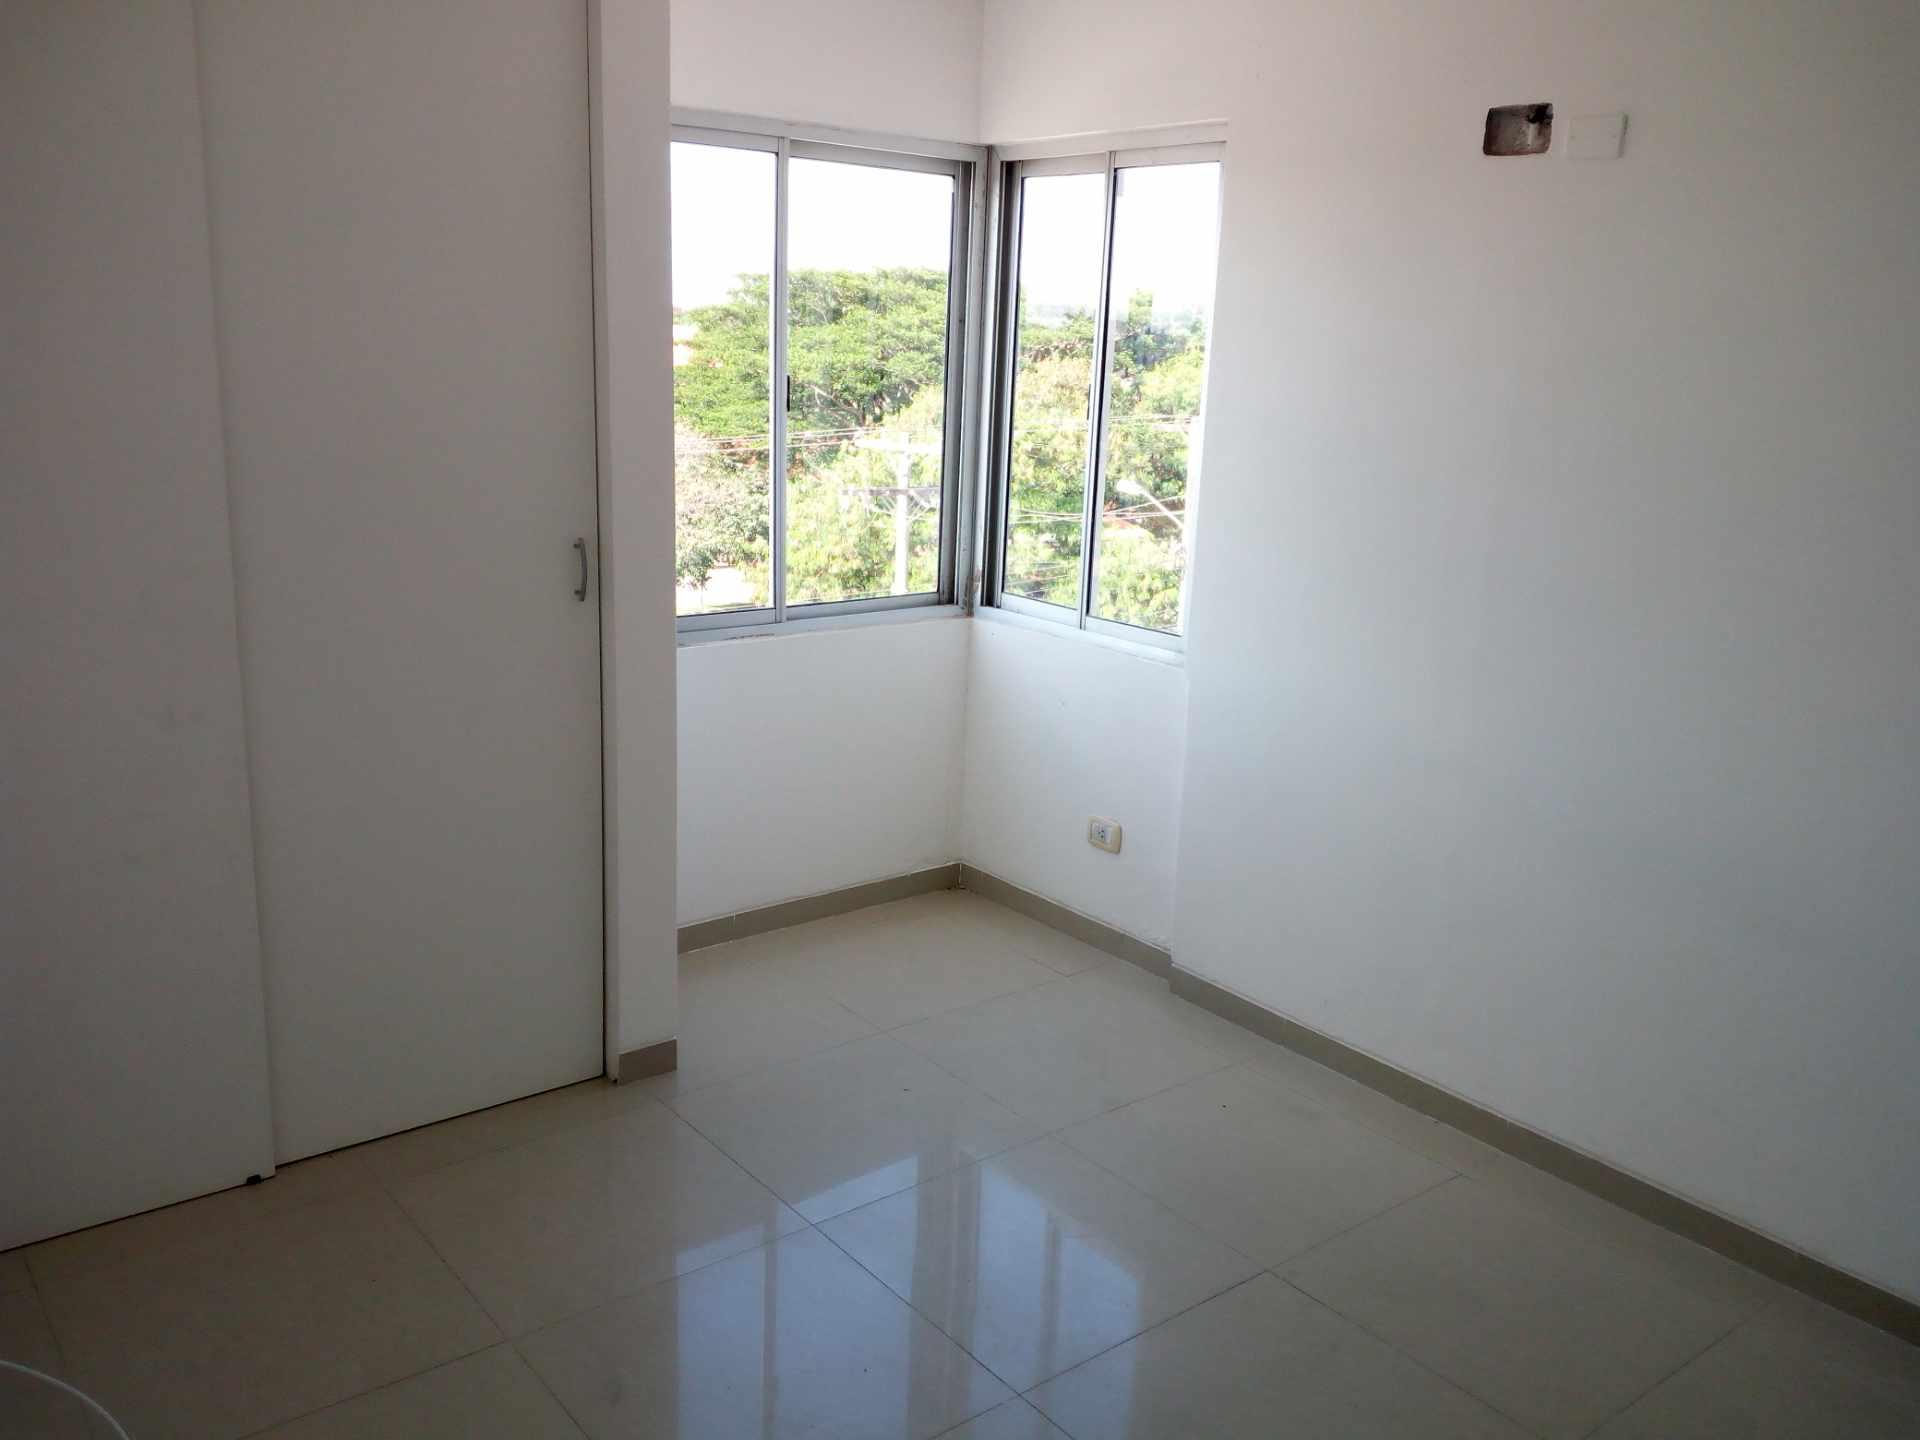 Departamento en Venta Entre 3er y 2do Anillo, Av. Guapay (Canal Cotoca) Foto 10